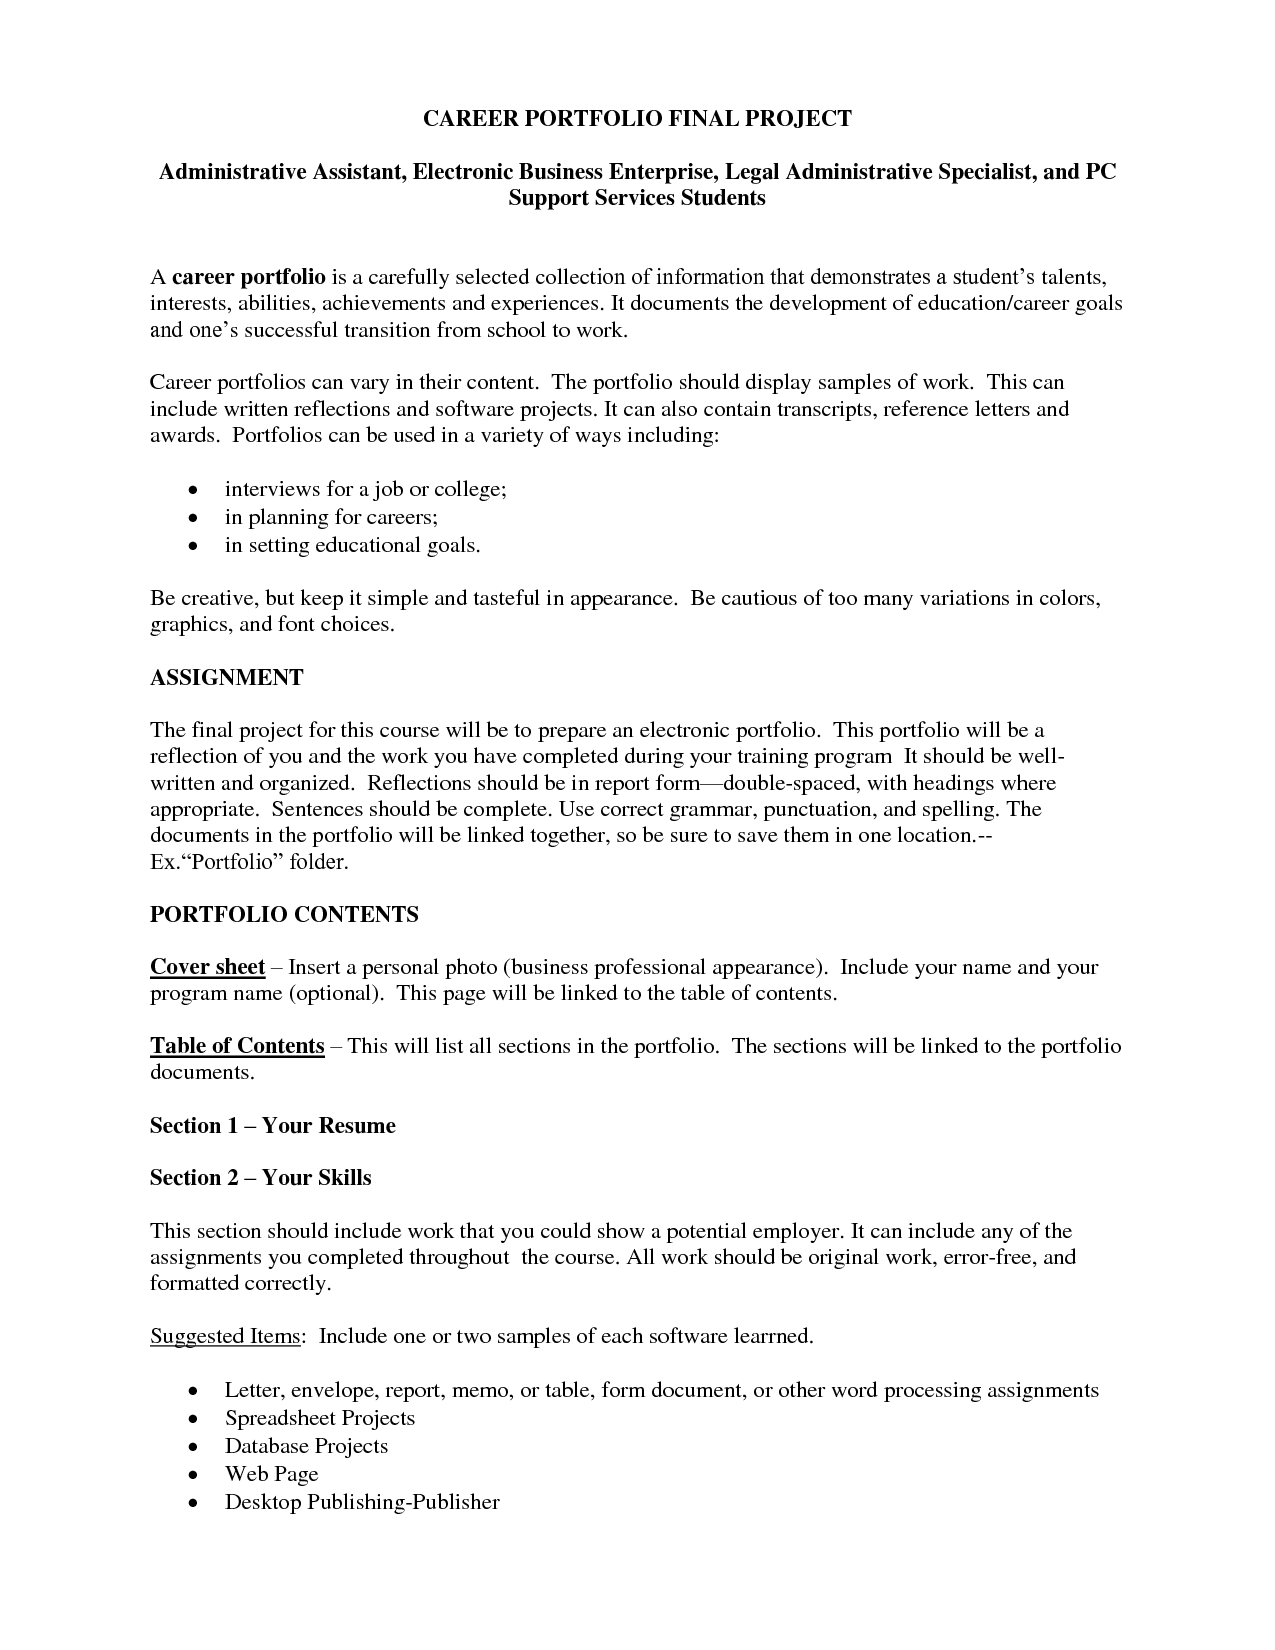 Legal Administrative Resume Samples